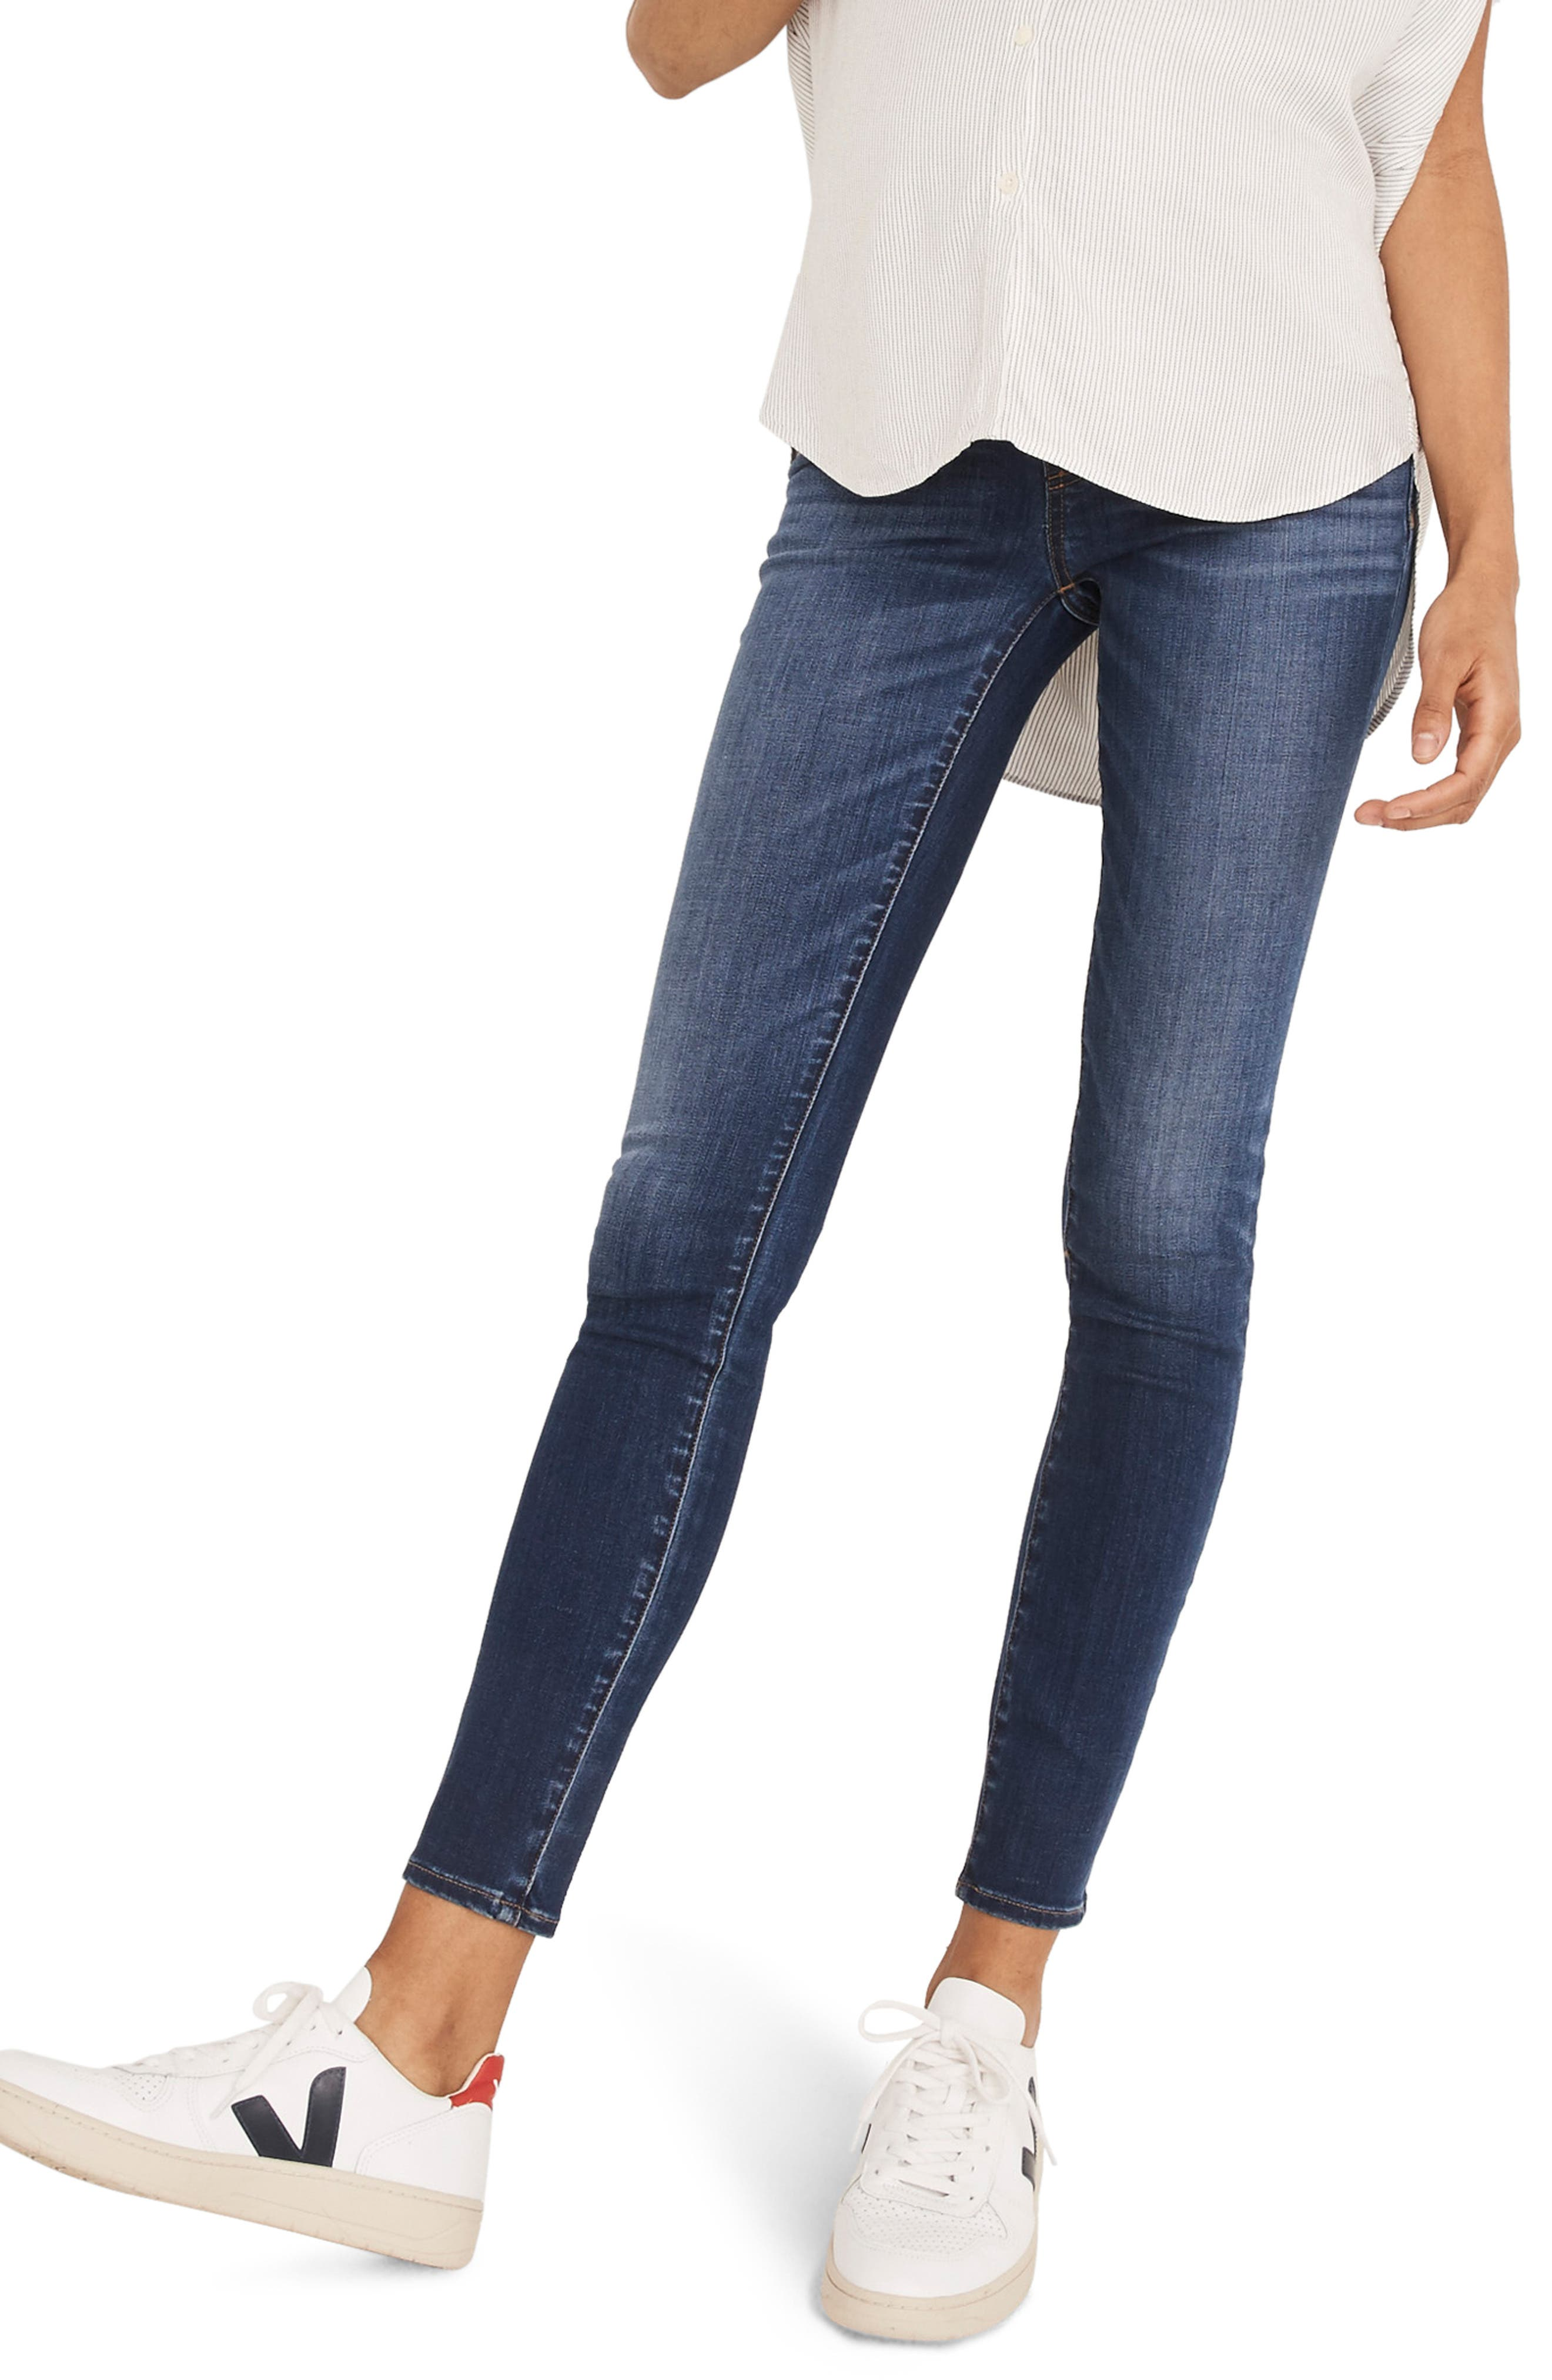 Maternity Skinny Jeans,                             Main thumbnail 1, color,                             DANNY